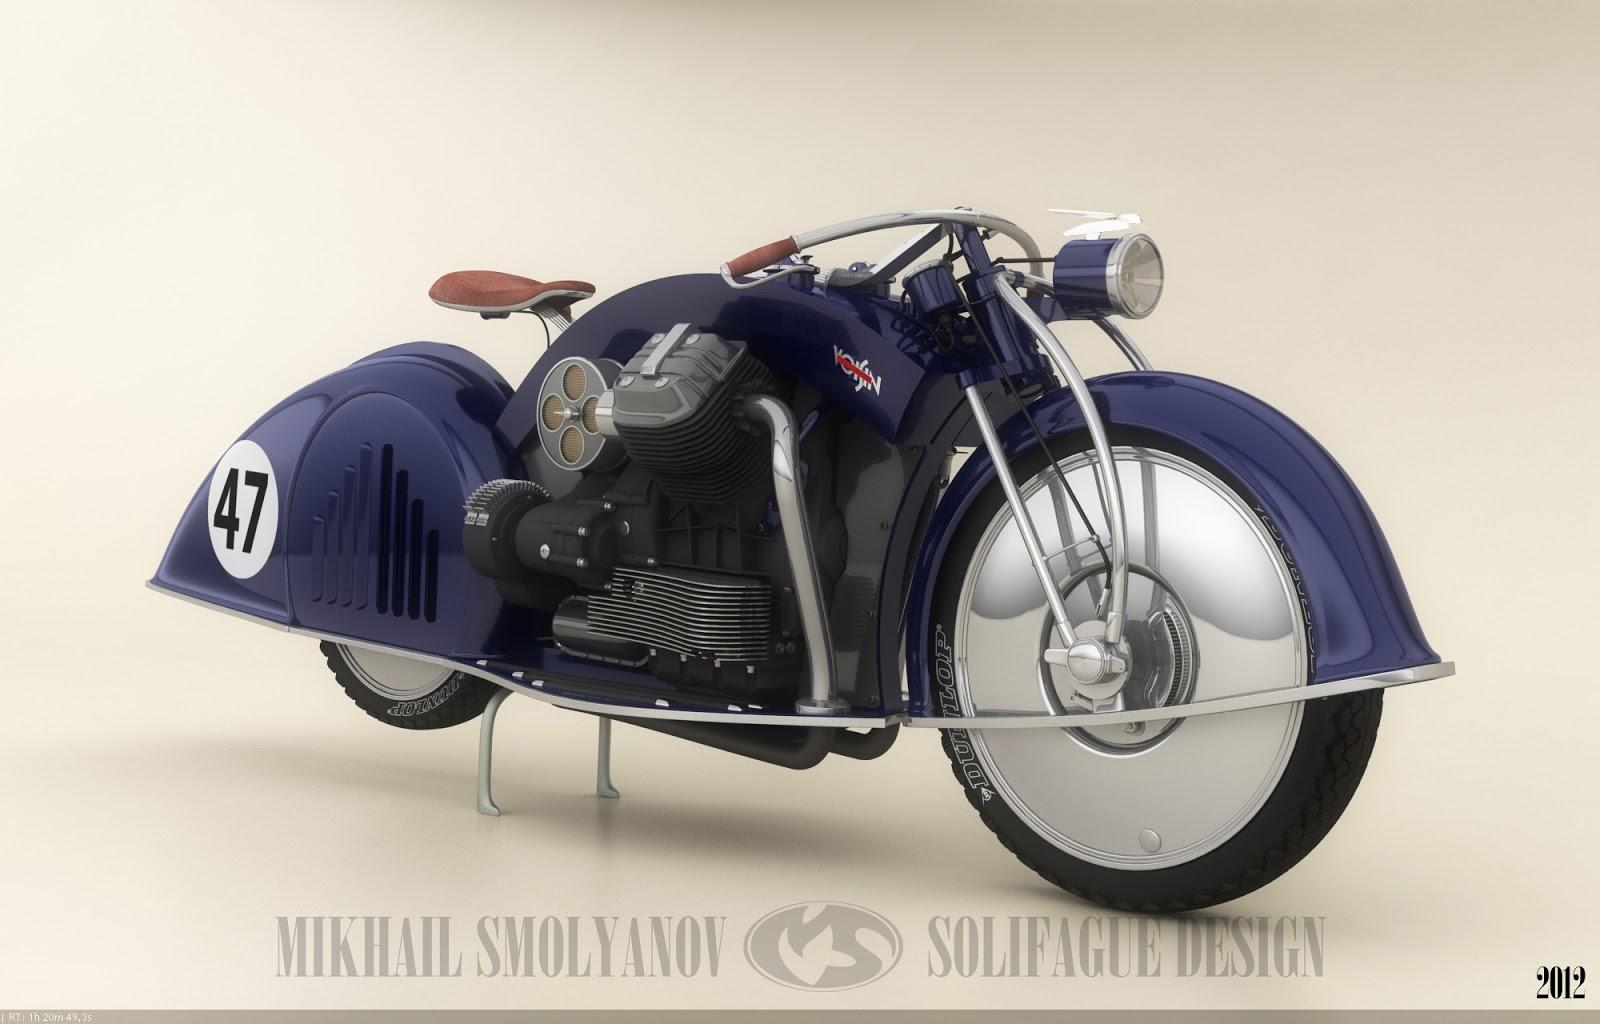 1934 Voisin Aerodyne Inspired Vsn 47 Concept Motorcycle